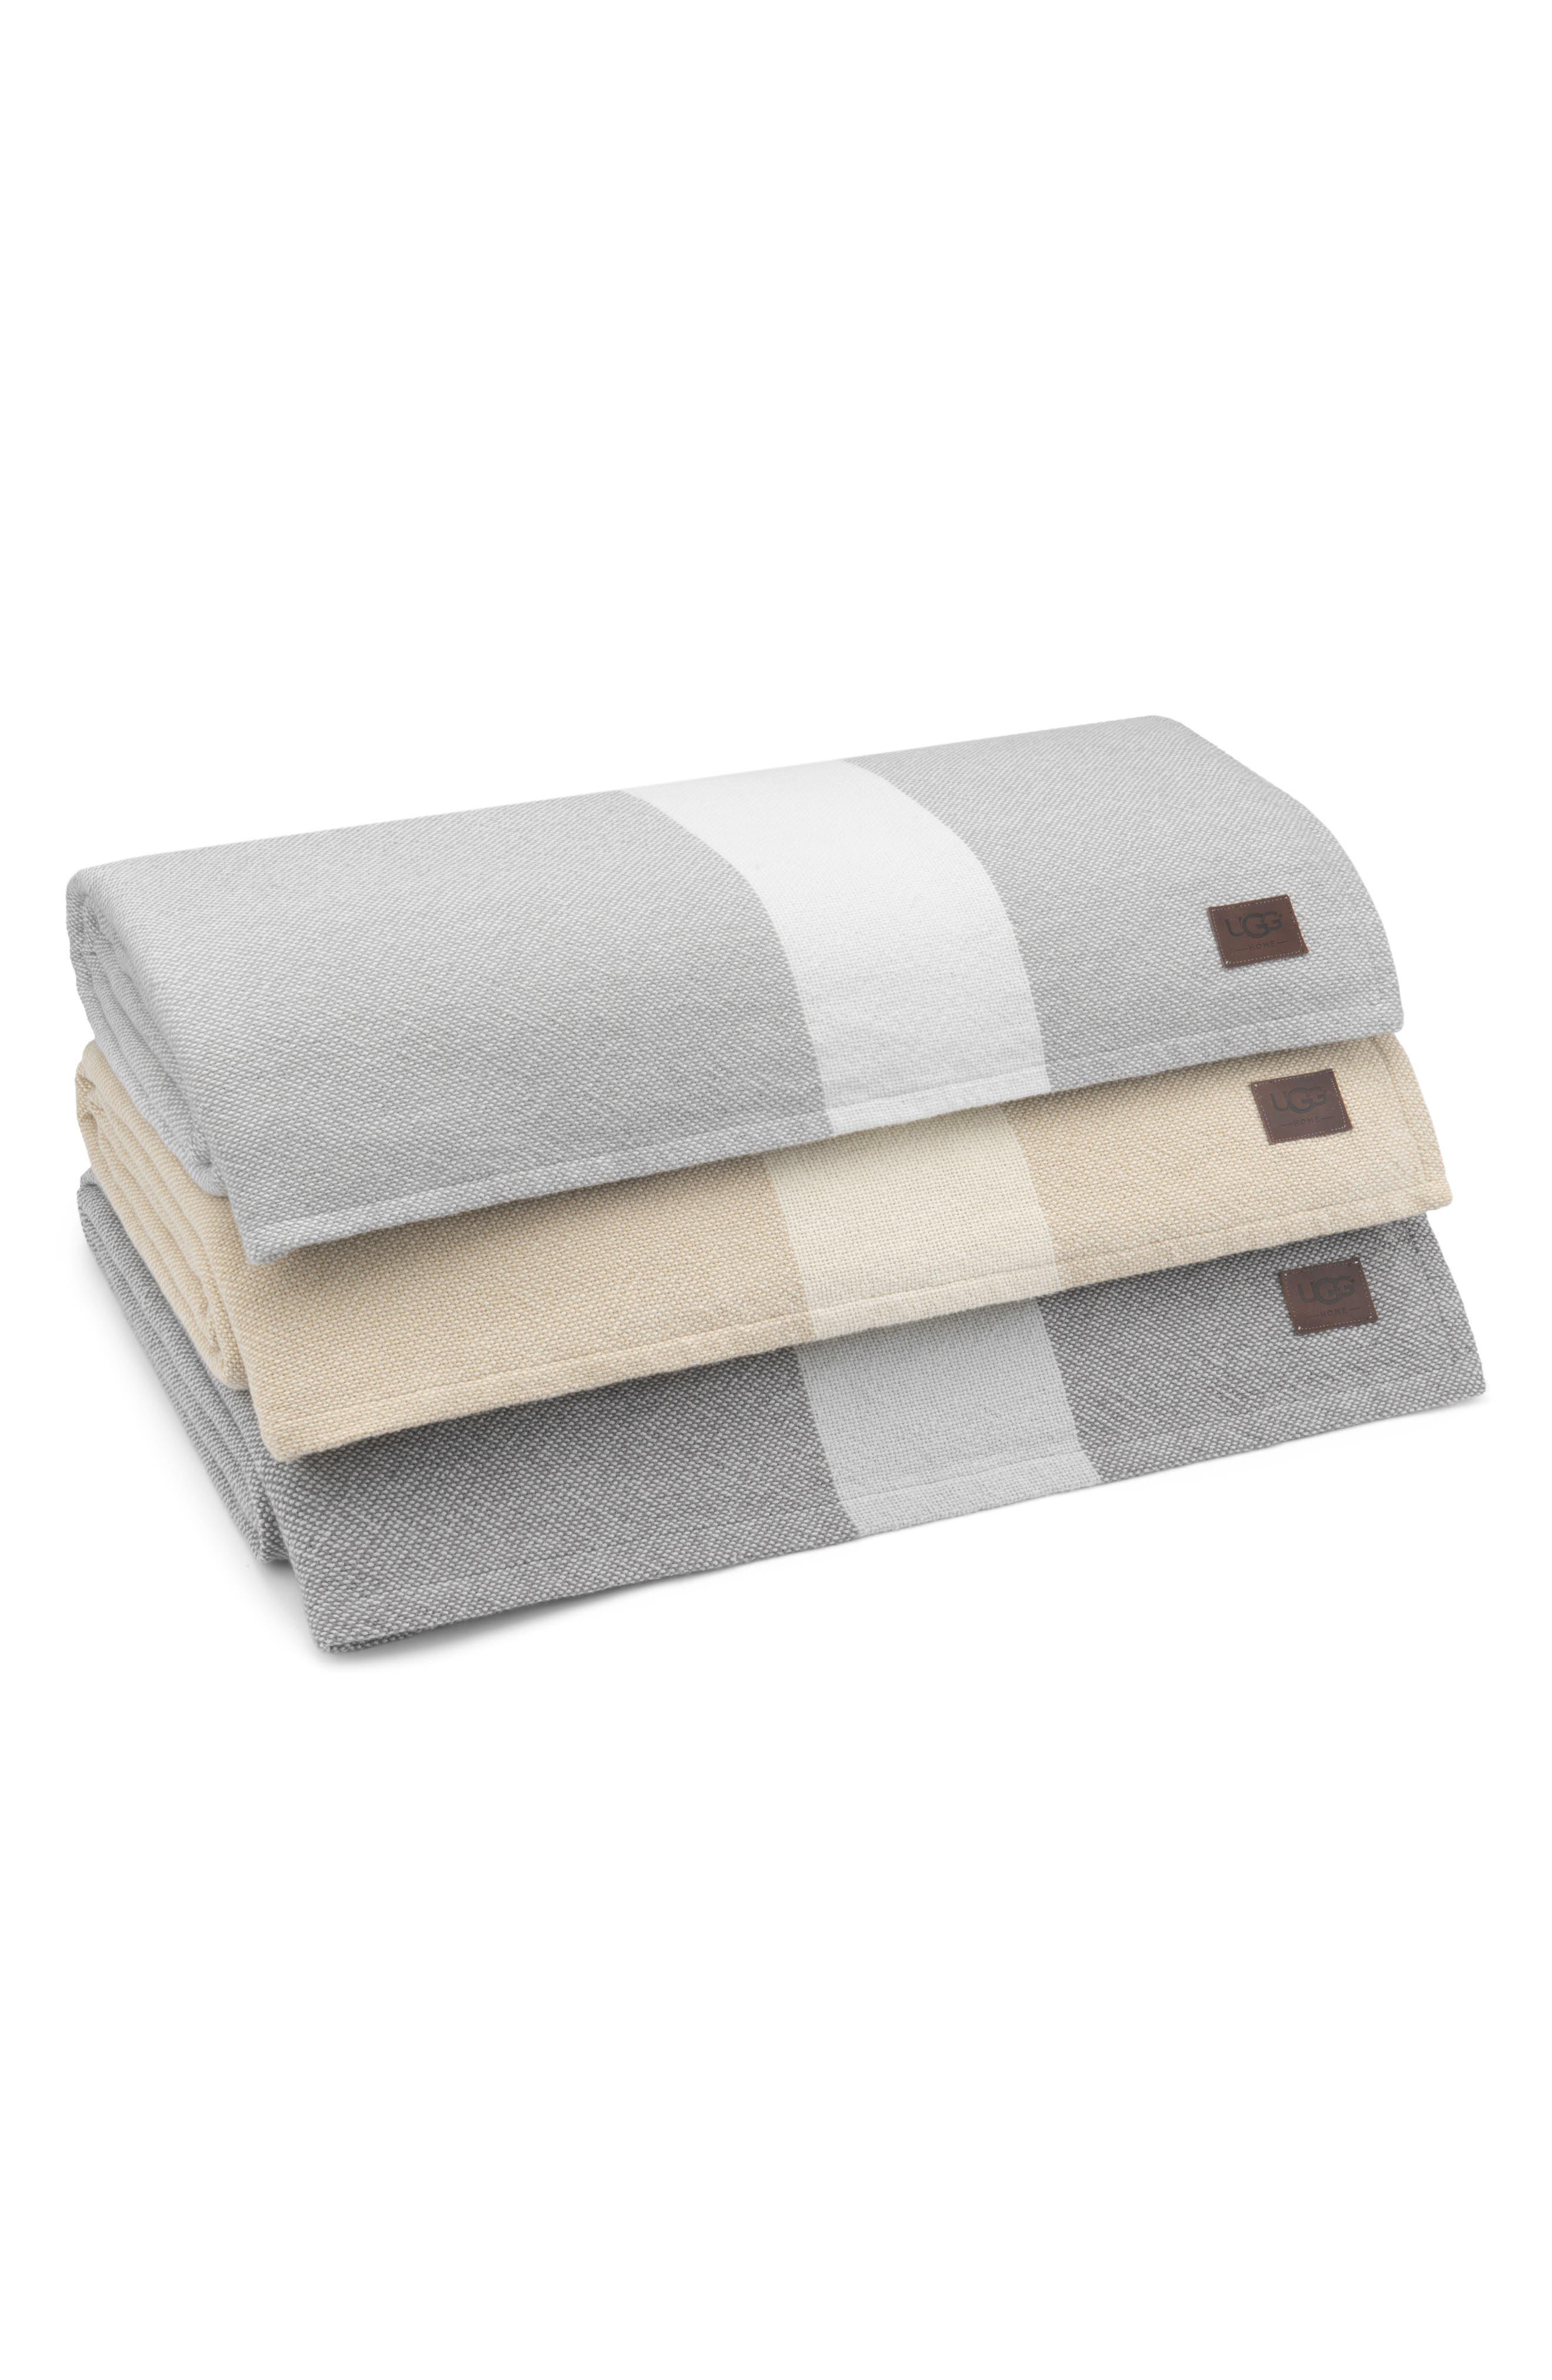 Coastal Heritage Blanket,                         Main,                         color, 020